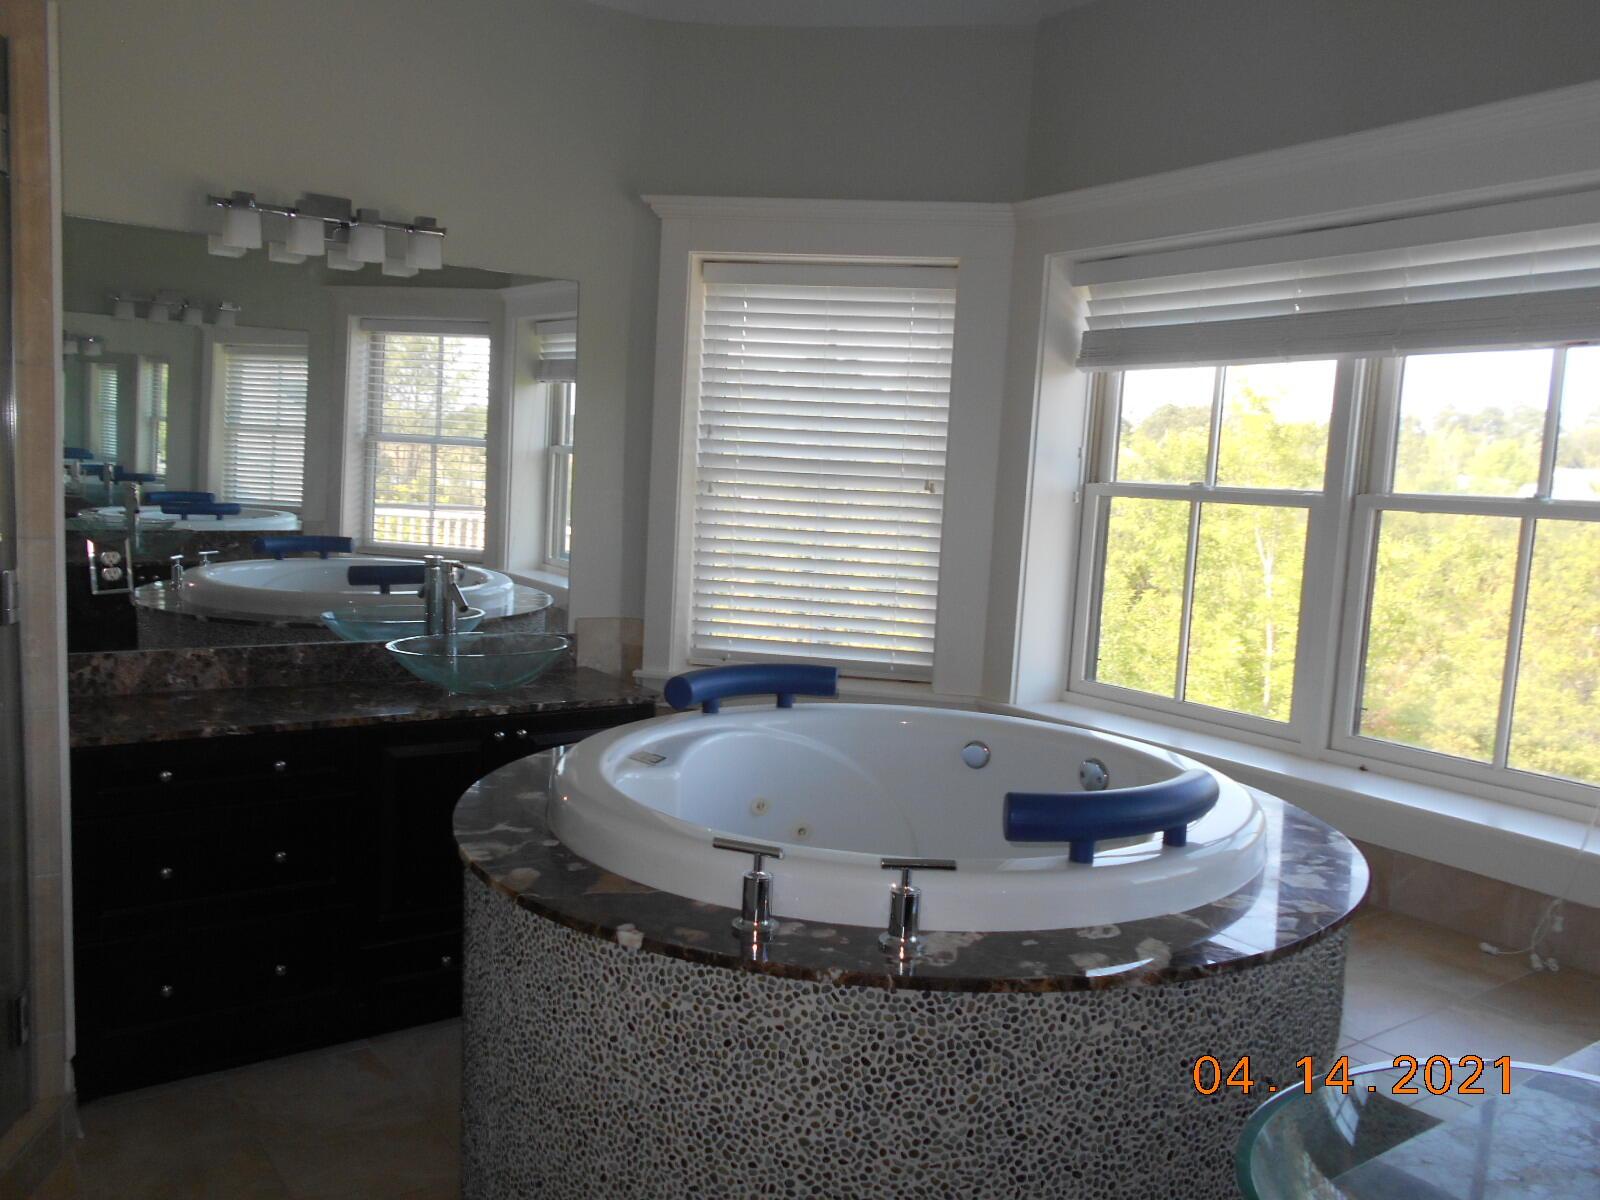 Beresford Creek Landing Homes For Sale - 1212 Winding Creek, Charleston, SC - 26